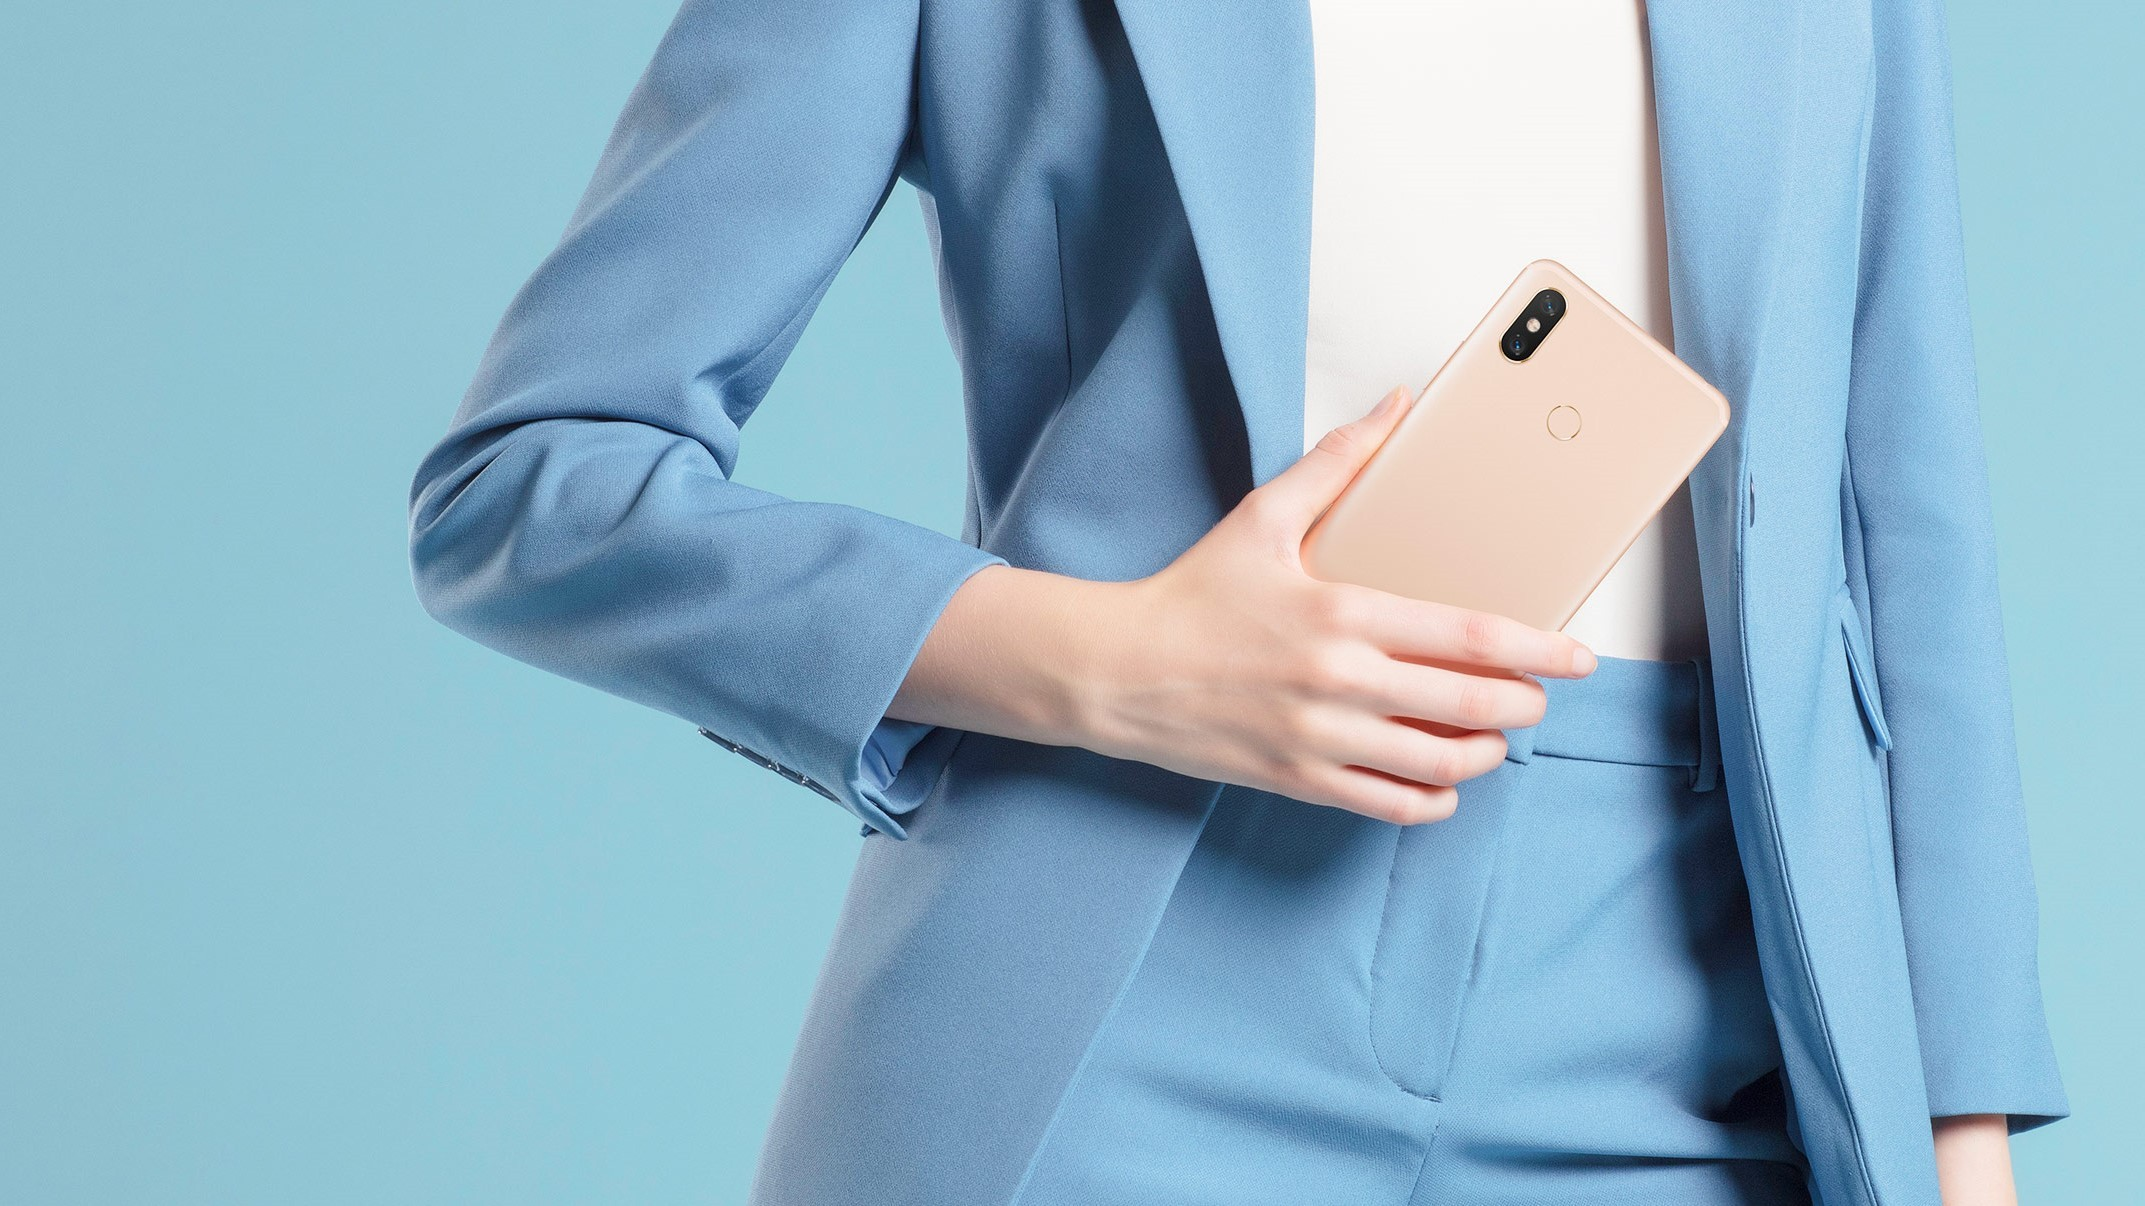 Анонс Xiaomi Mi Max 3 — сотворение гиганта